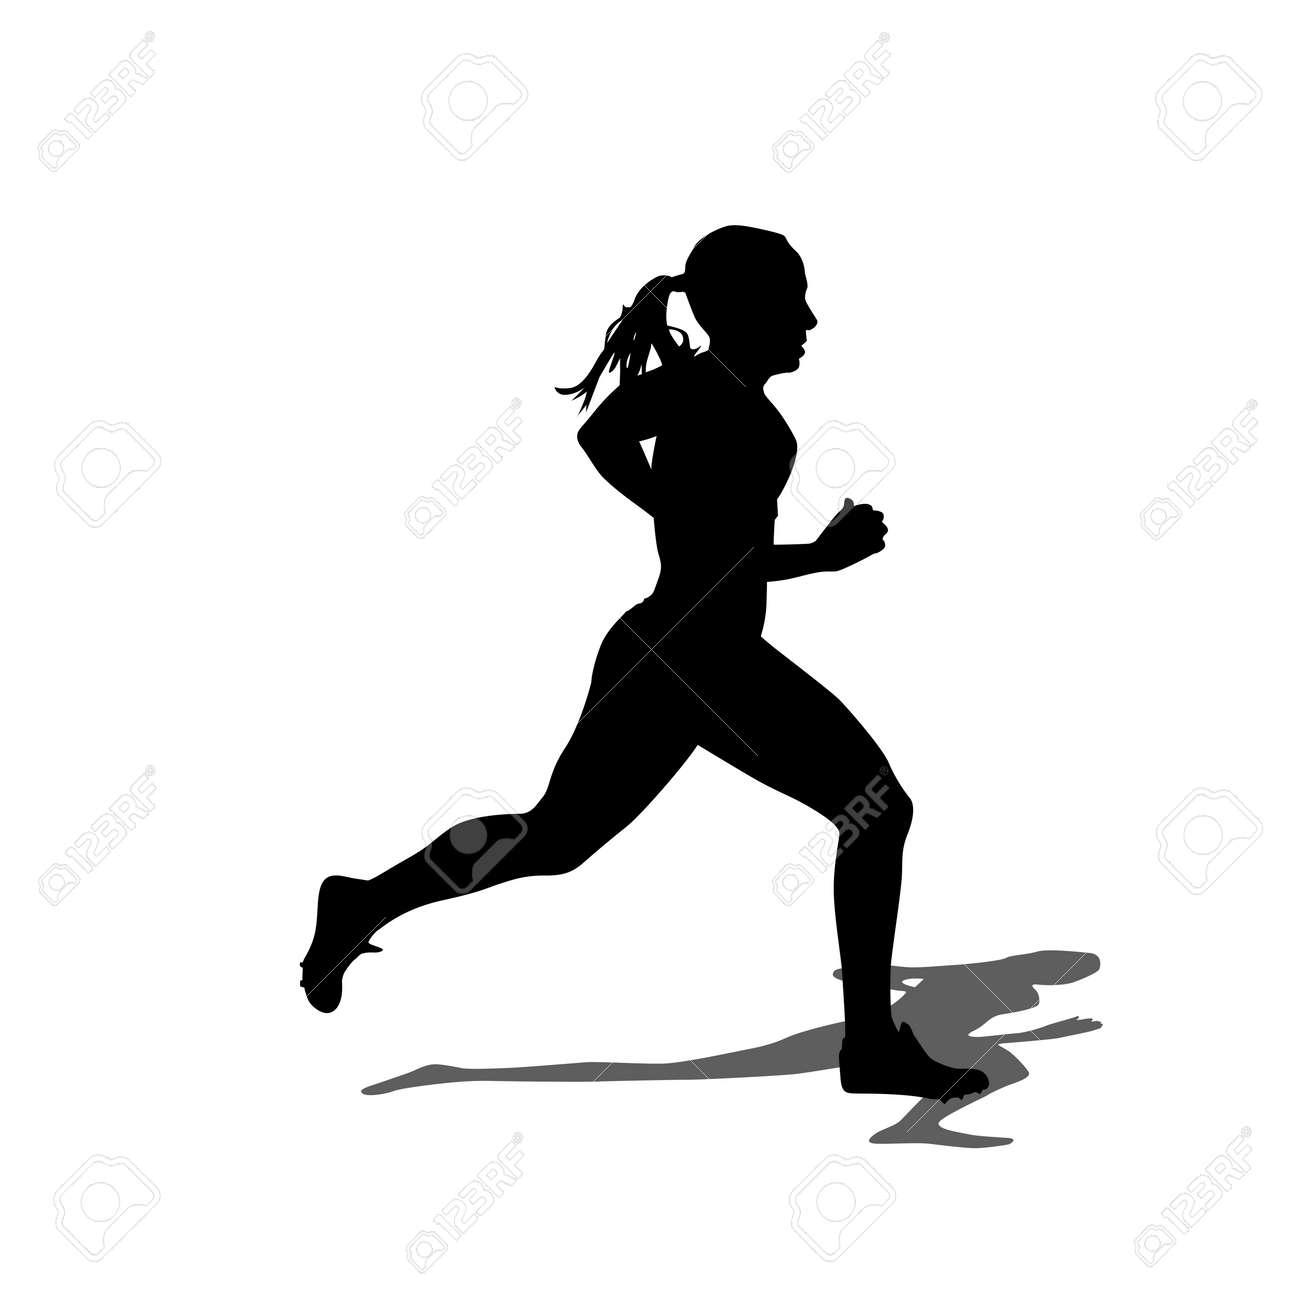 Running silhouettes. Vector illustration. - 20671731